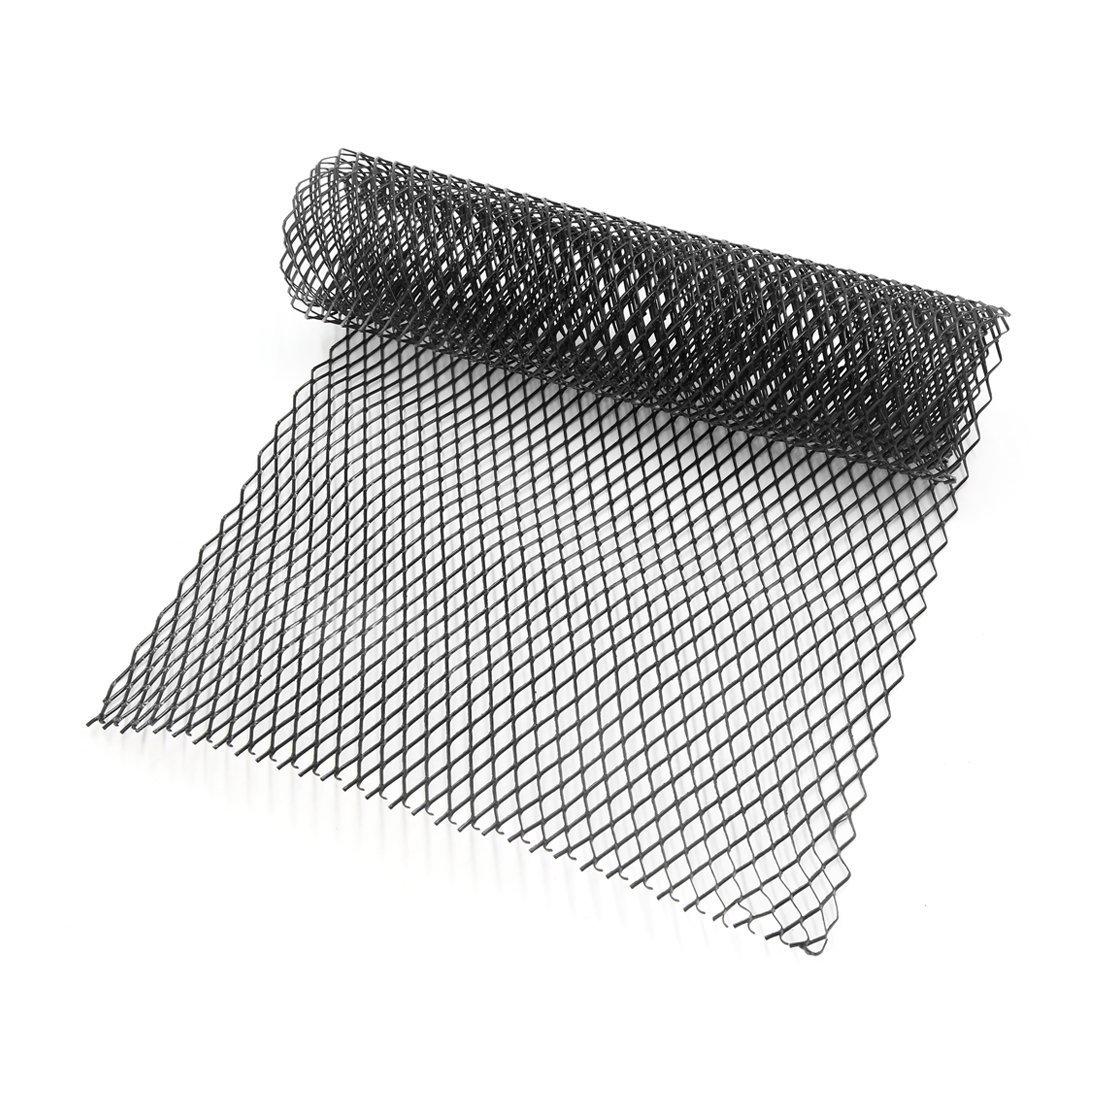 Lanlan 8x16mm Car Grill Grille Vent Mesh Aluminum Alloy Front Bumper Rhombic Grill Mesh Sheet Silver